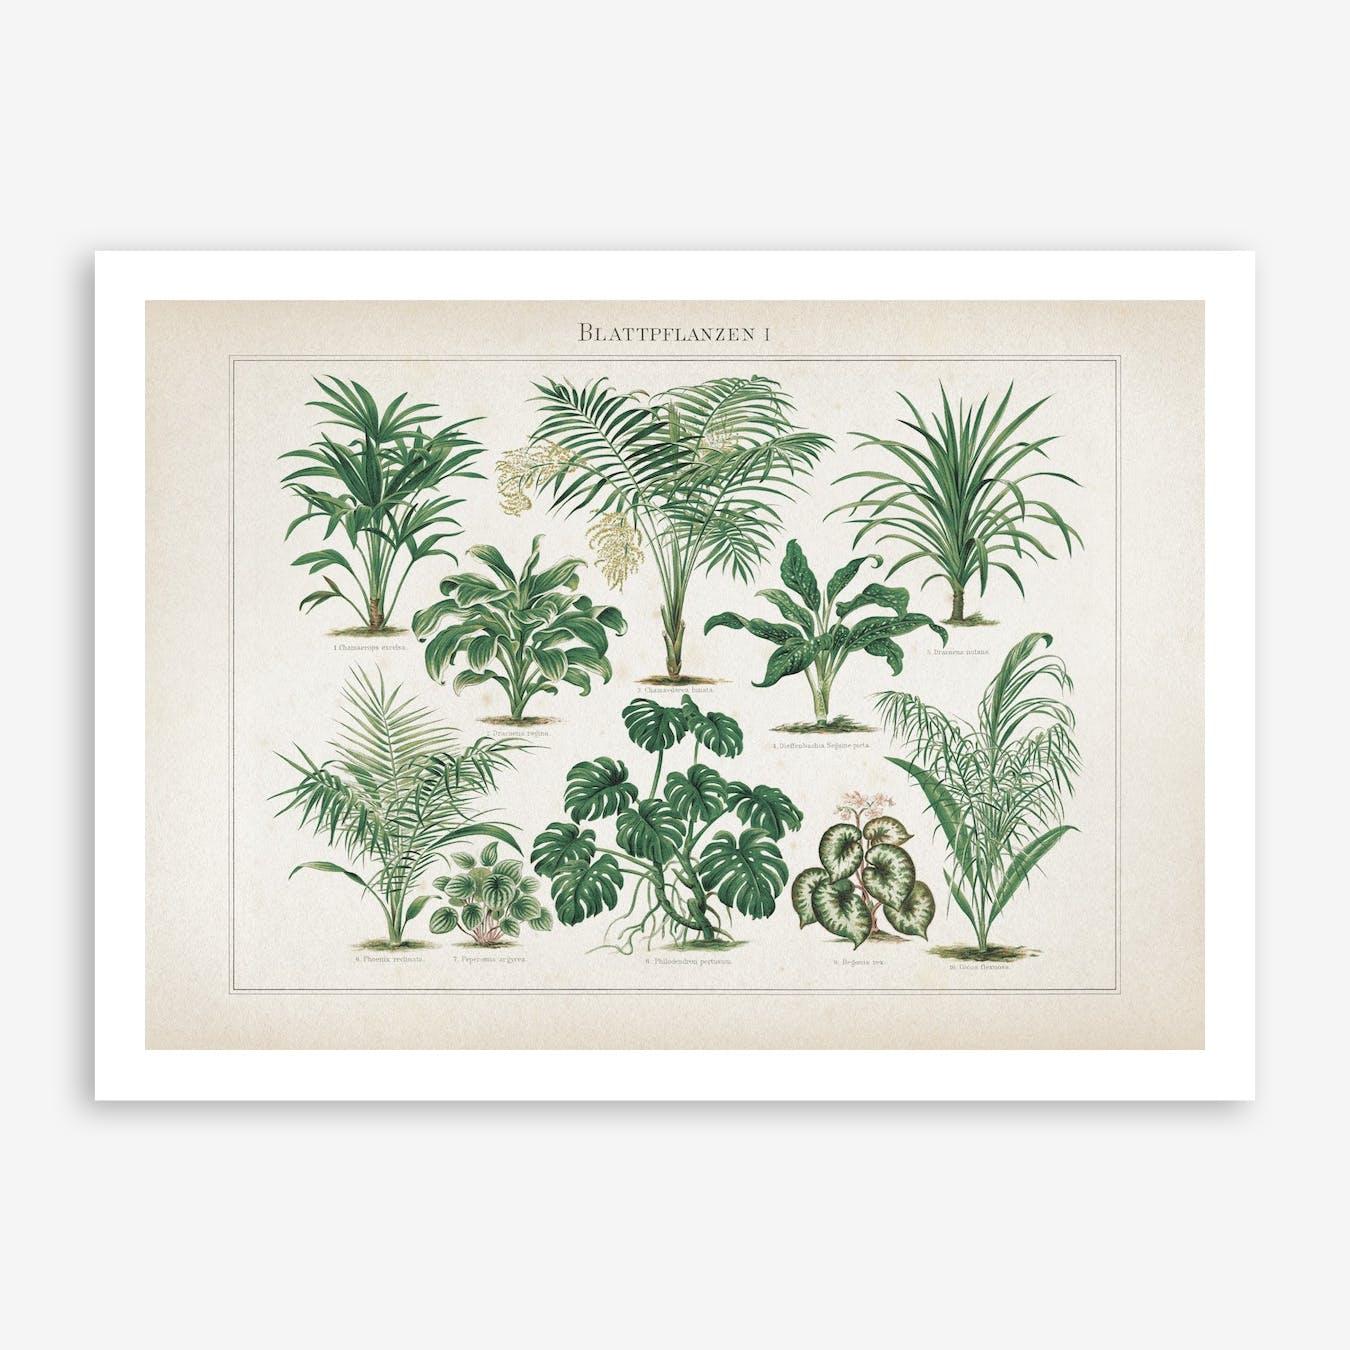 Vintage Meyers 1 Blattpflanzen 1